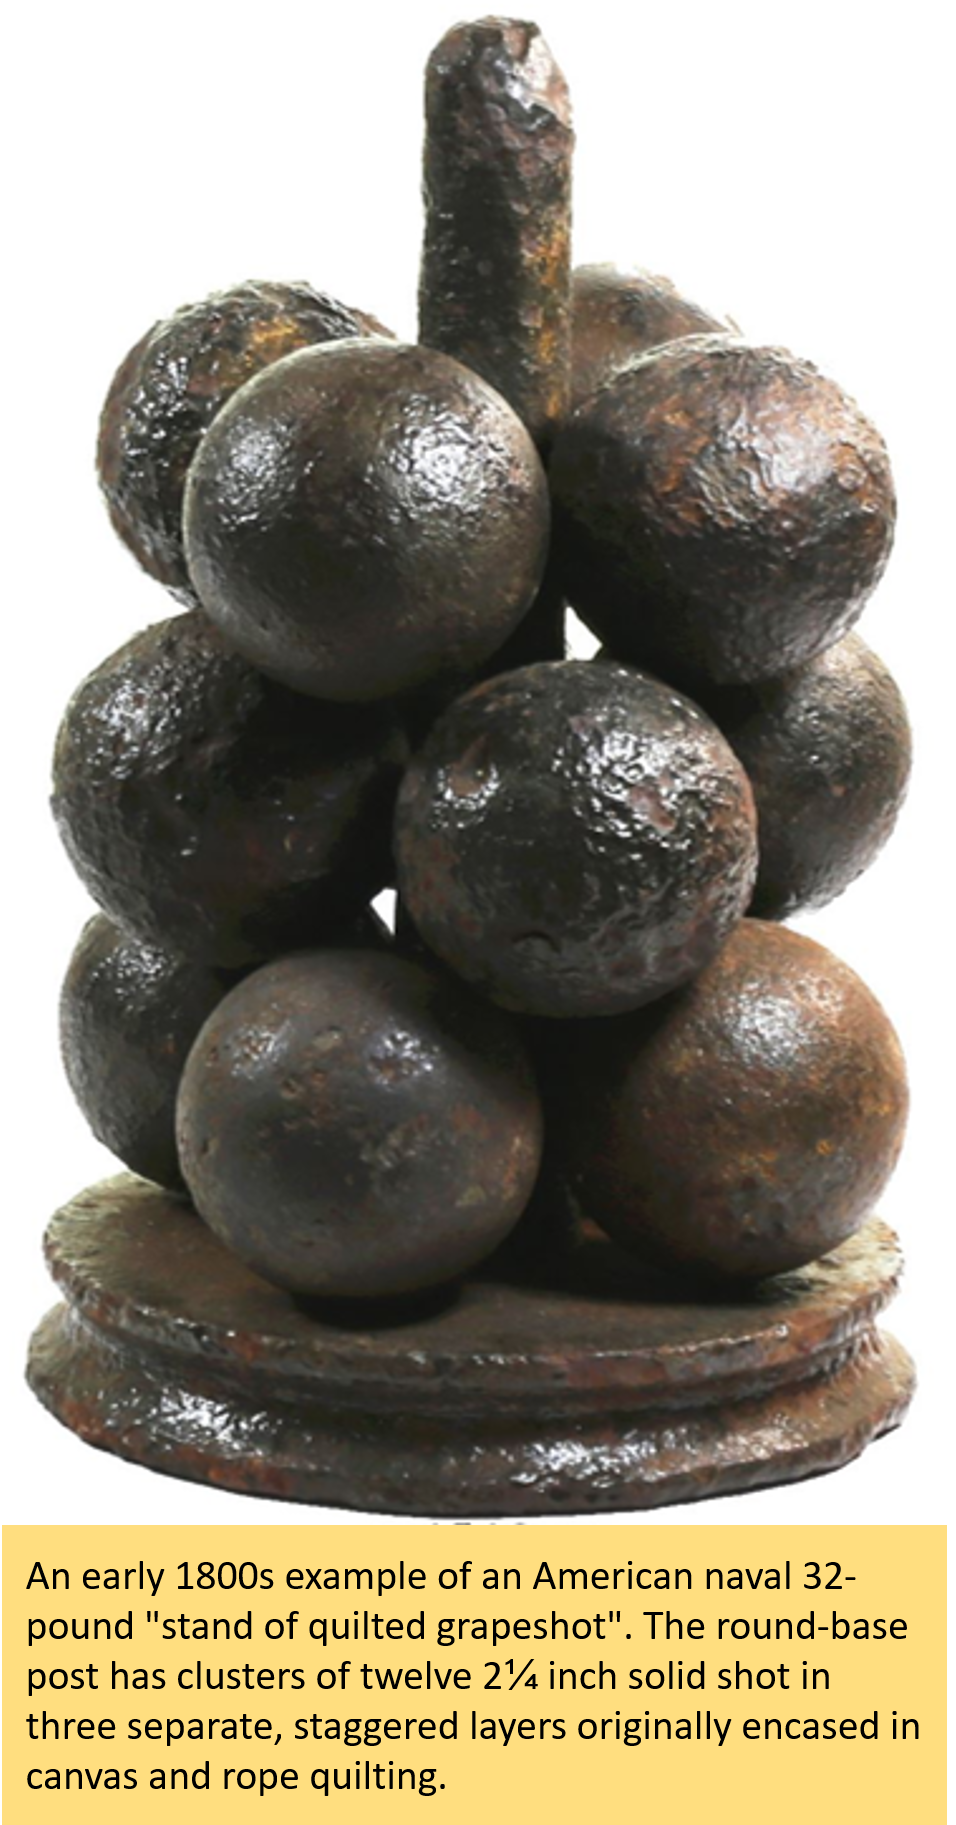 An example of iron grapeshot.